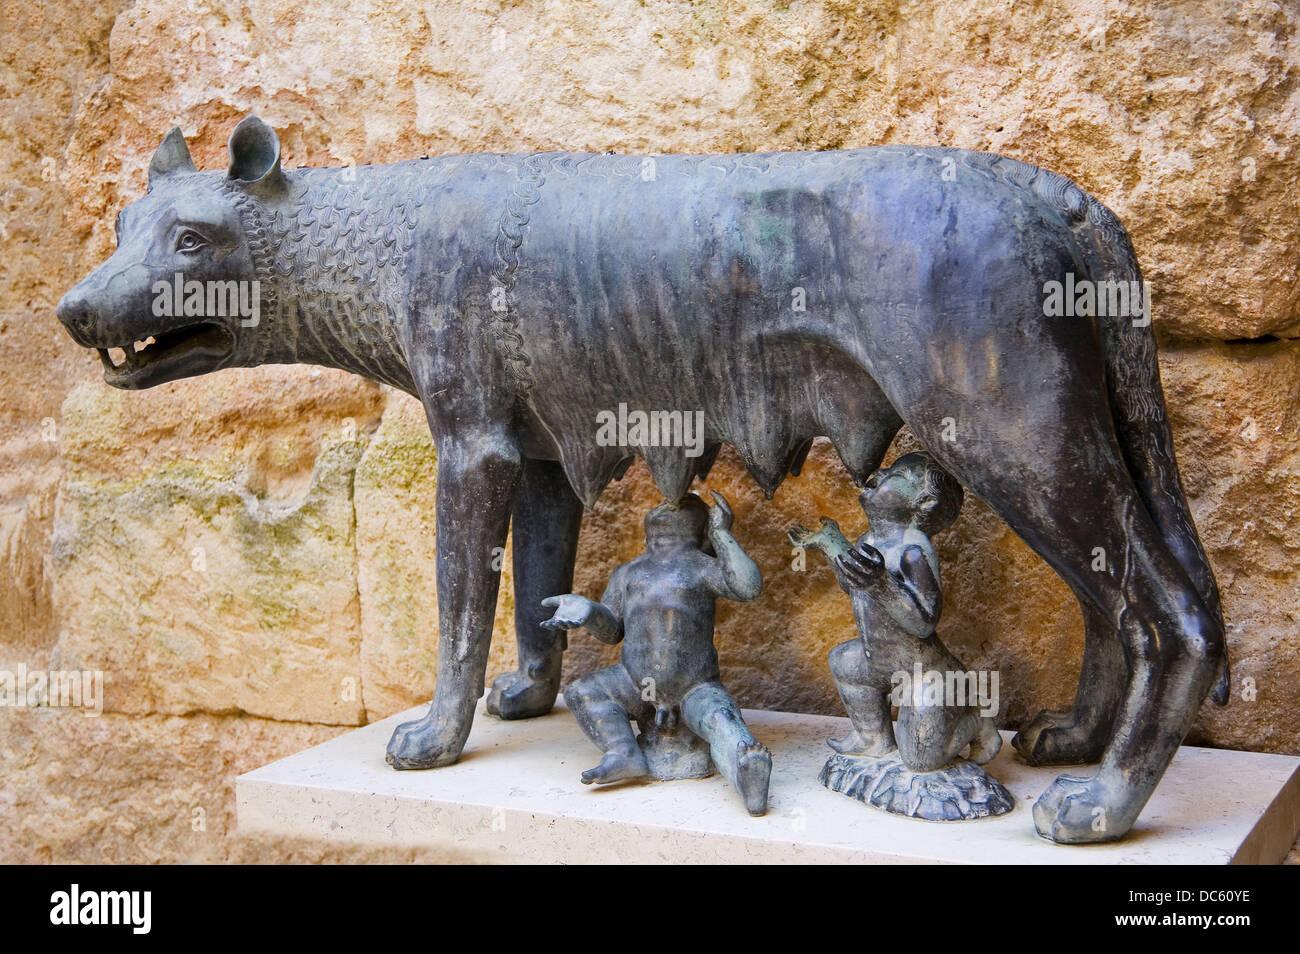 Spain-Tarragona-   statue of Romulus and Remus, at the roman Forum, at Tarragona. - Stock Image